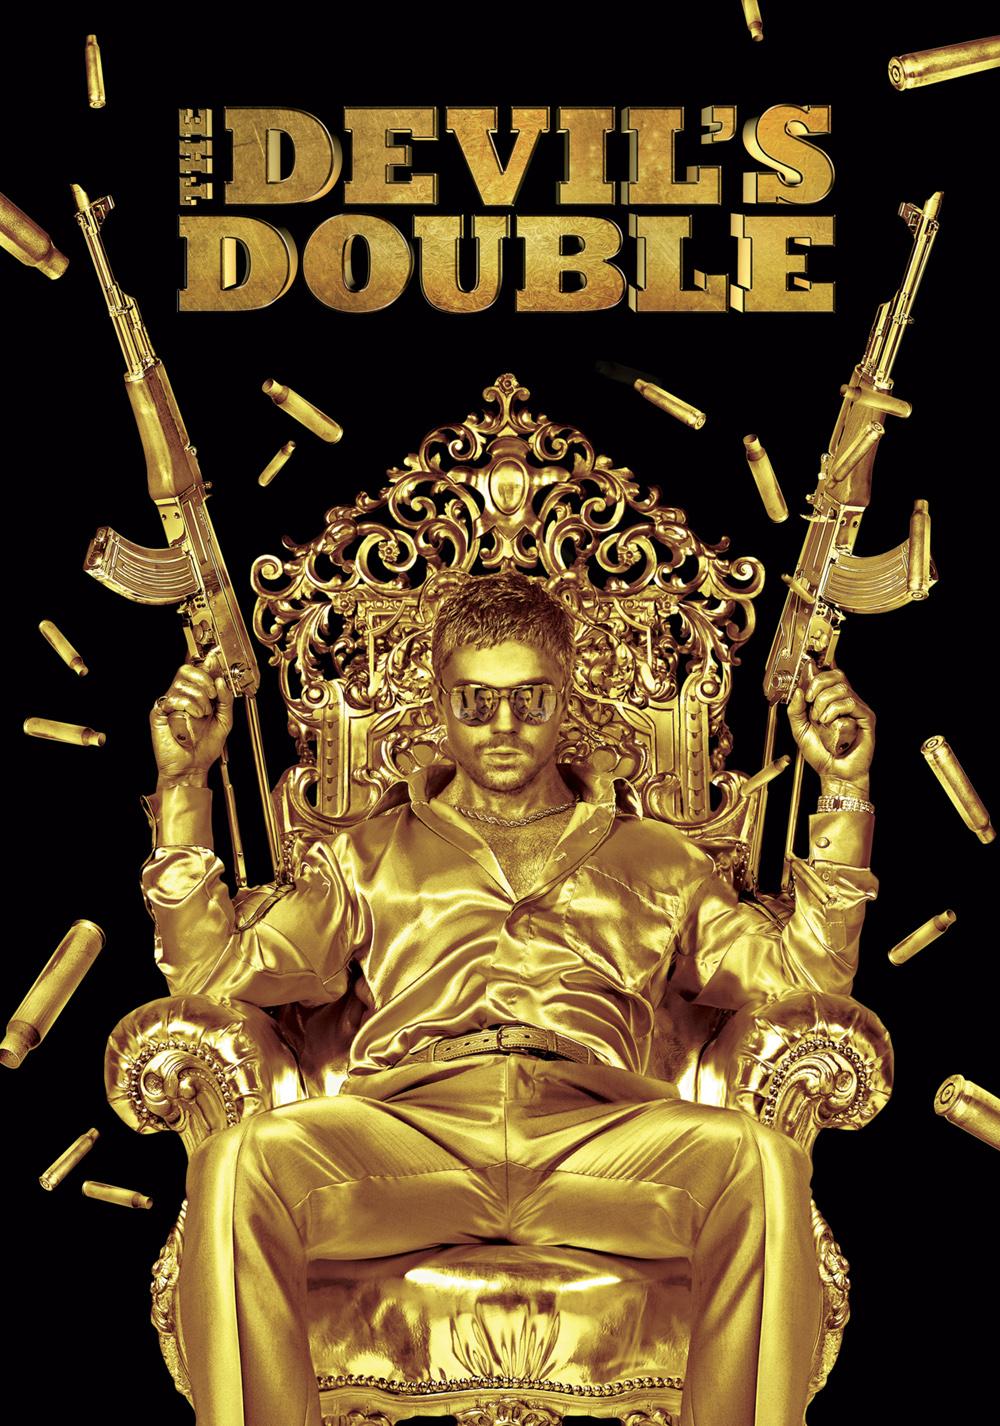 The devils double pellikola production malta